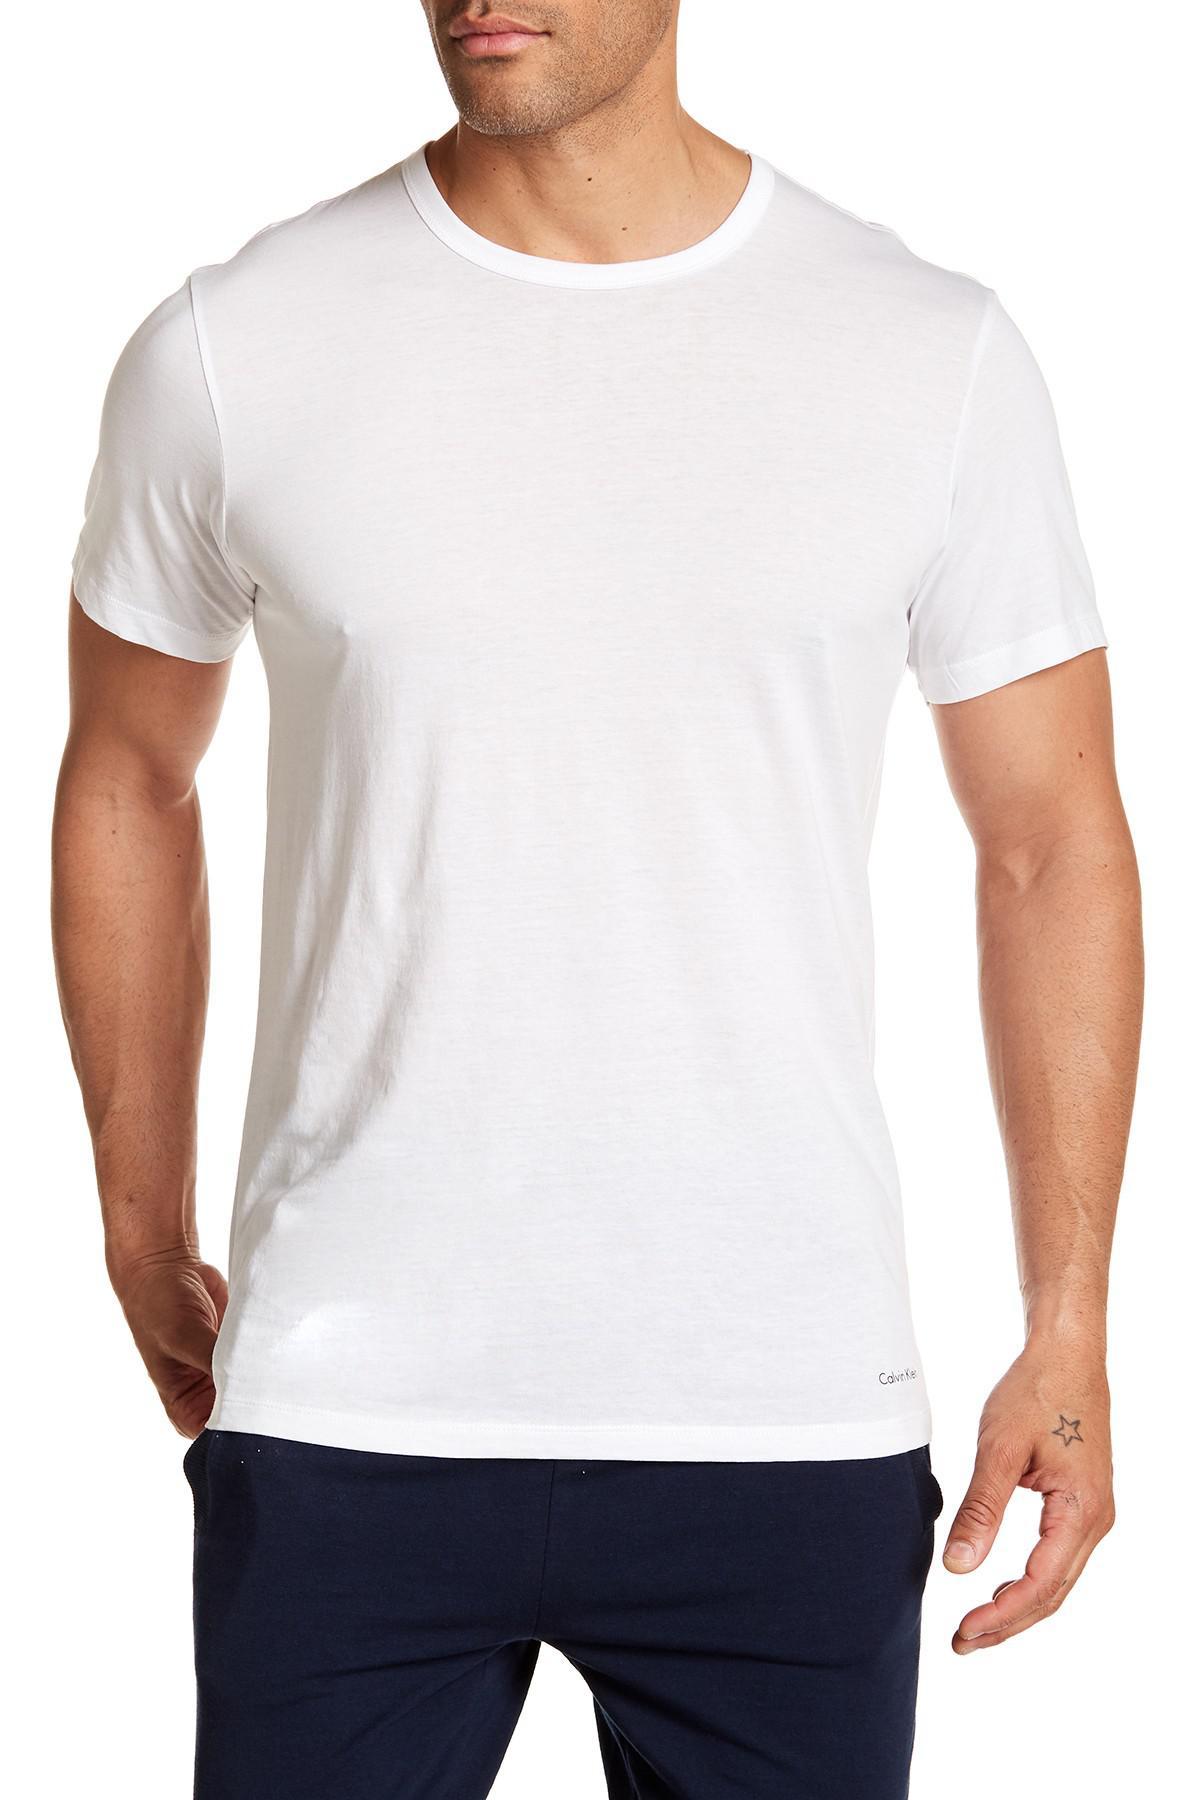 Lyst - Calvin Klein Slim Fit Cotton Crew Tee in White for Men 5c8ae69bd